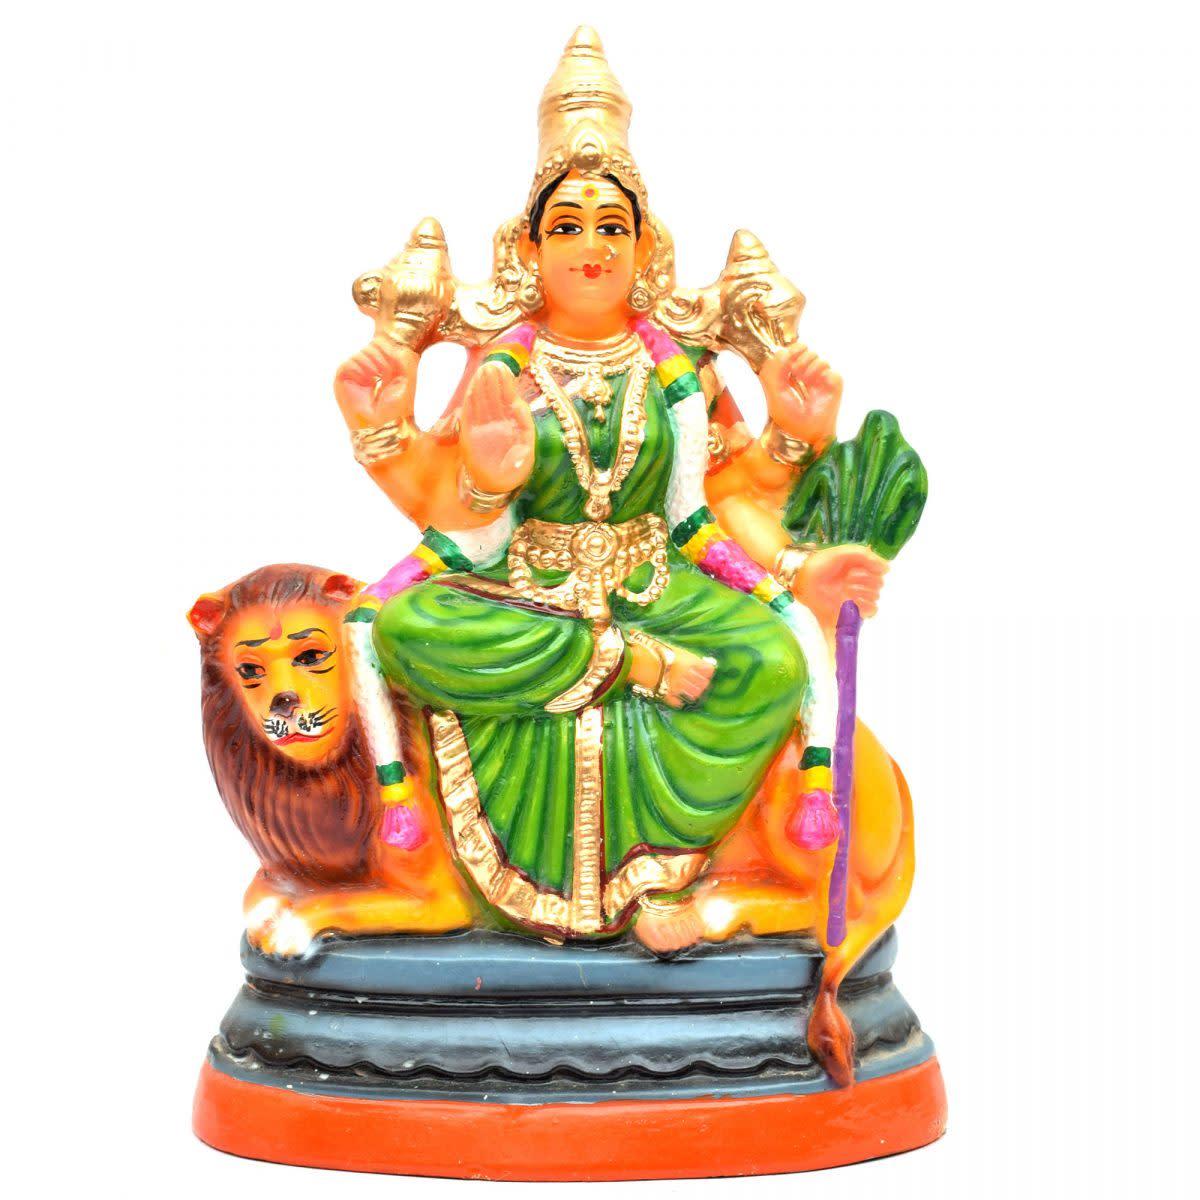 Sri Devi Rajarajeswari doll